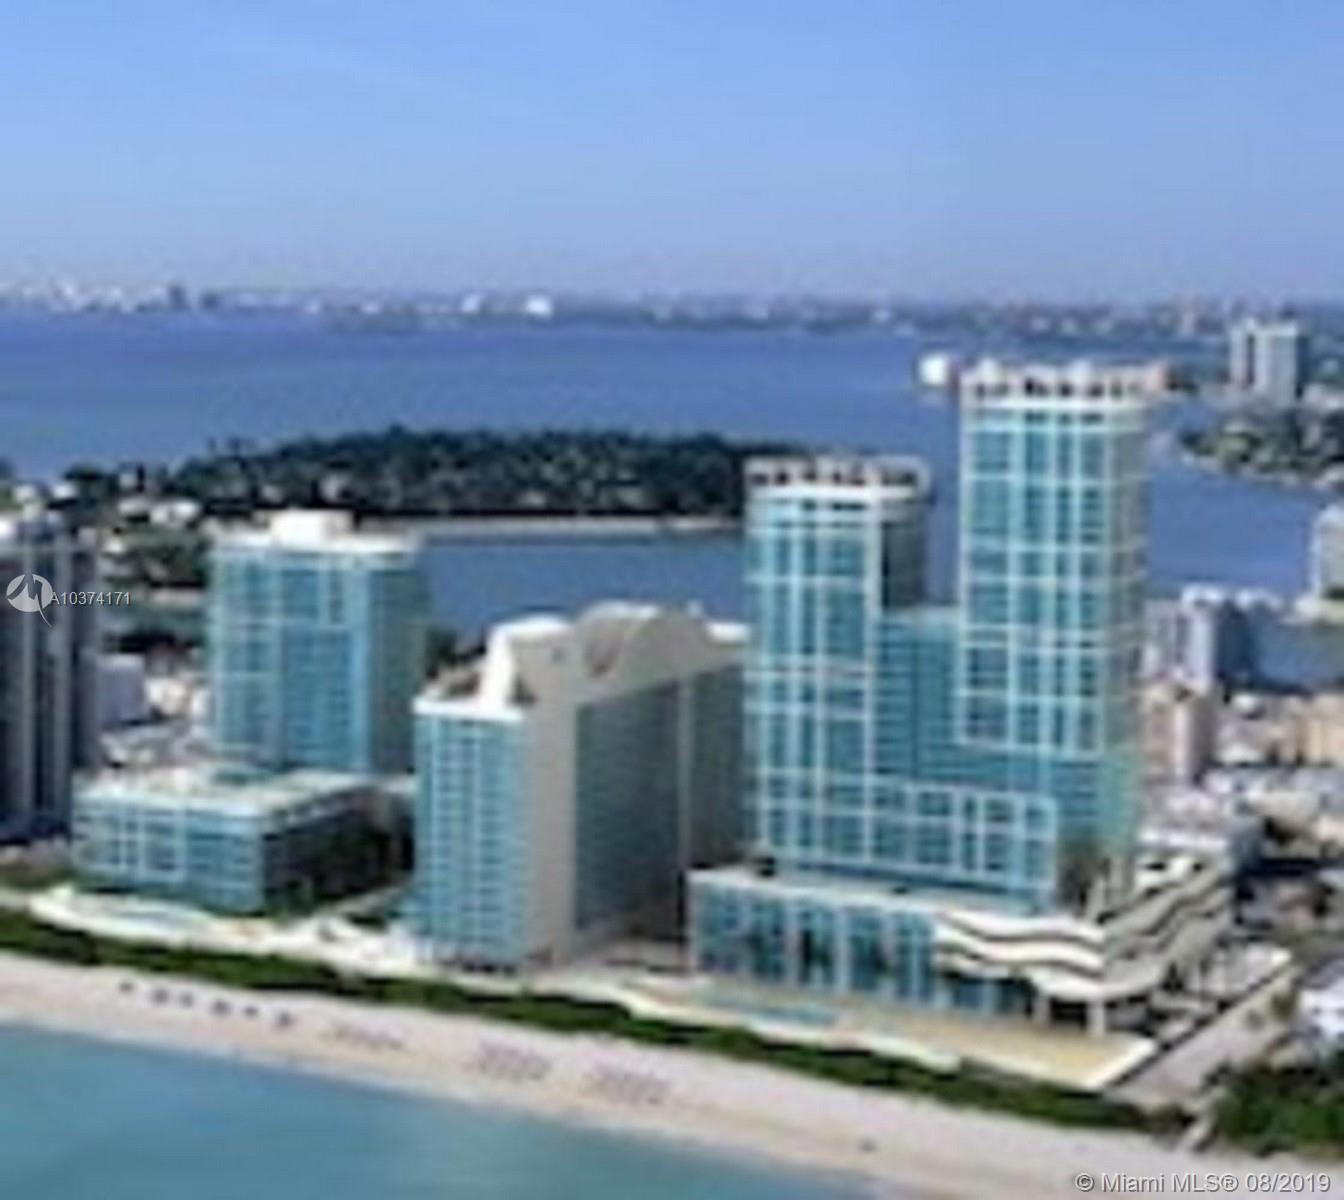 6899 Collins Ave #1005 Miami Beach, FL 33141 | Joelle Oiknine